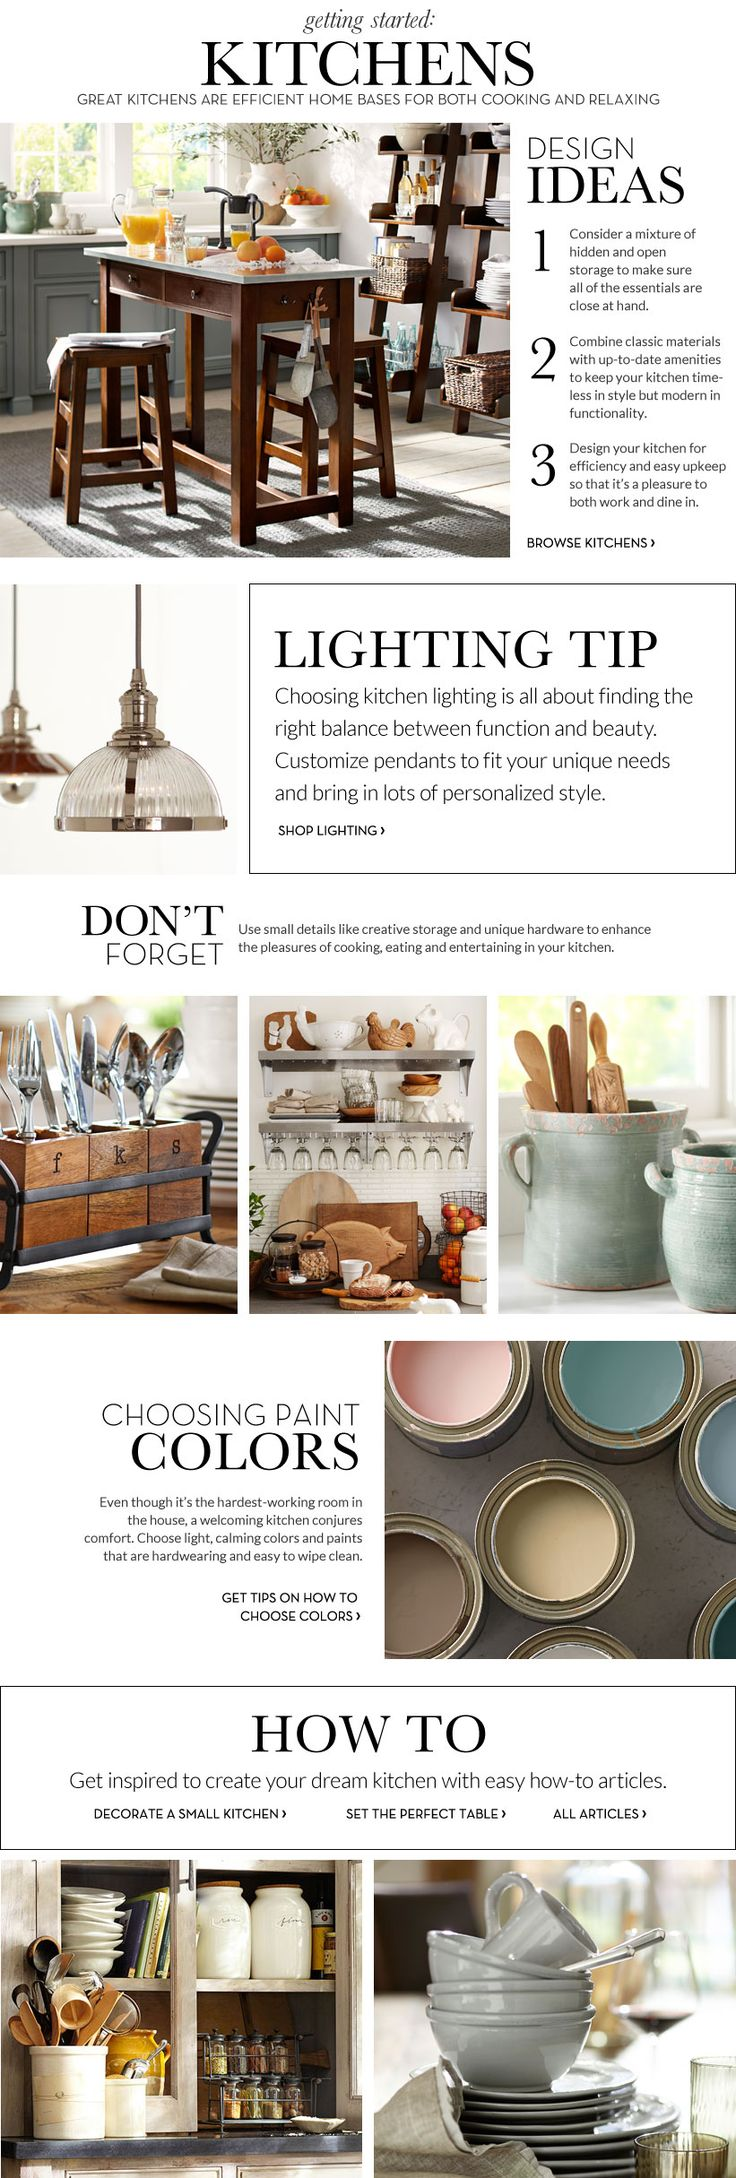 240 best kitchen images on pinterest kitchen kitchen ideas and